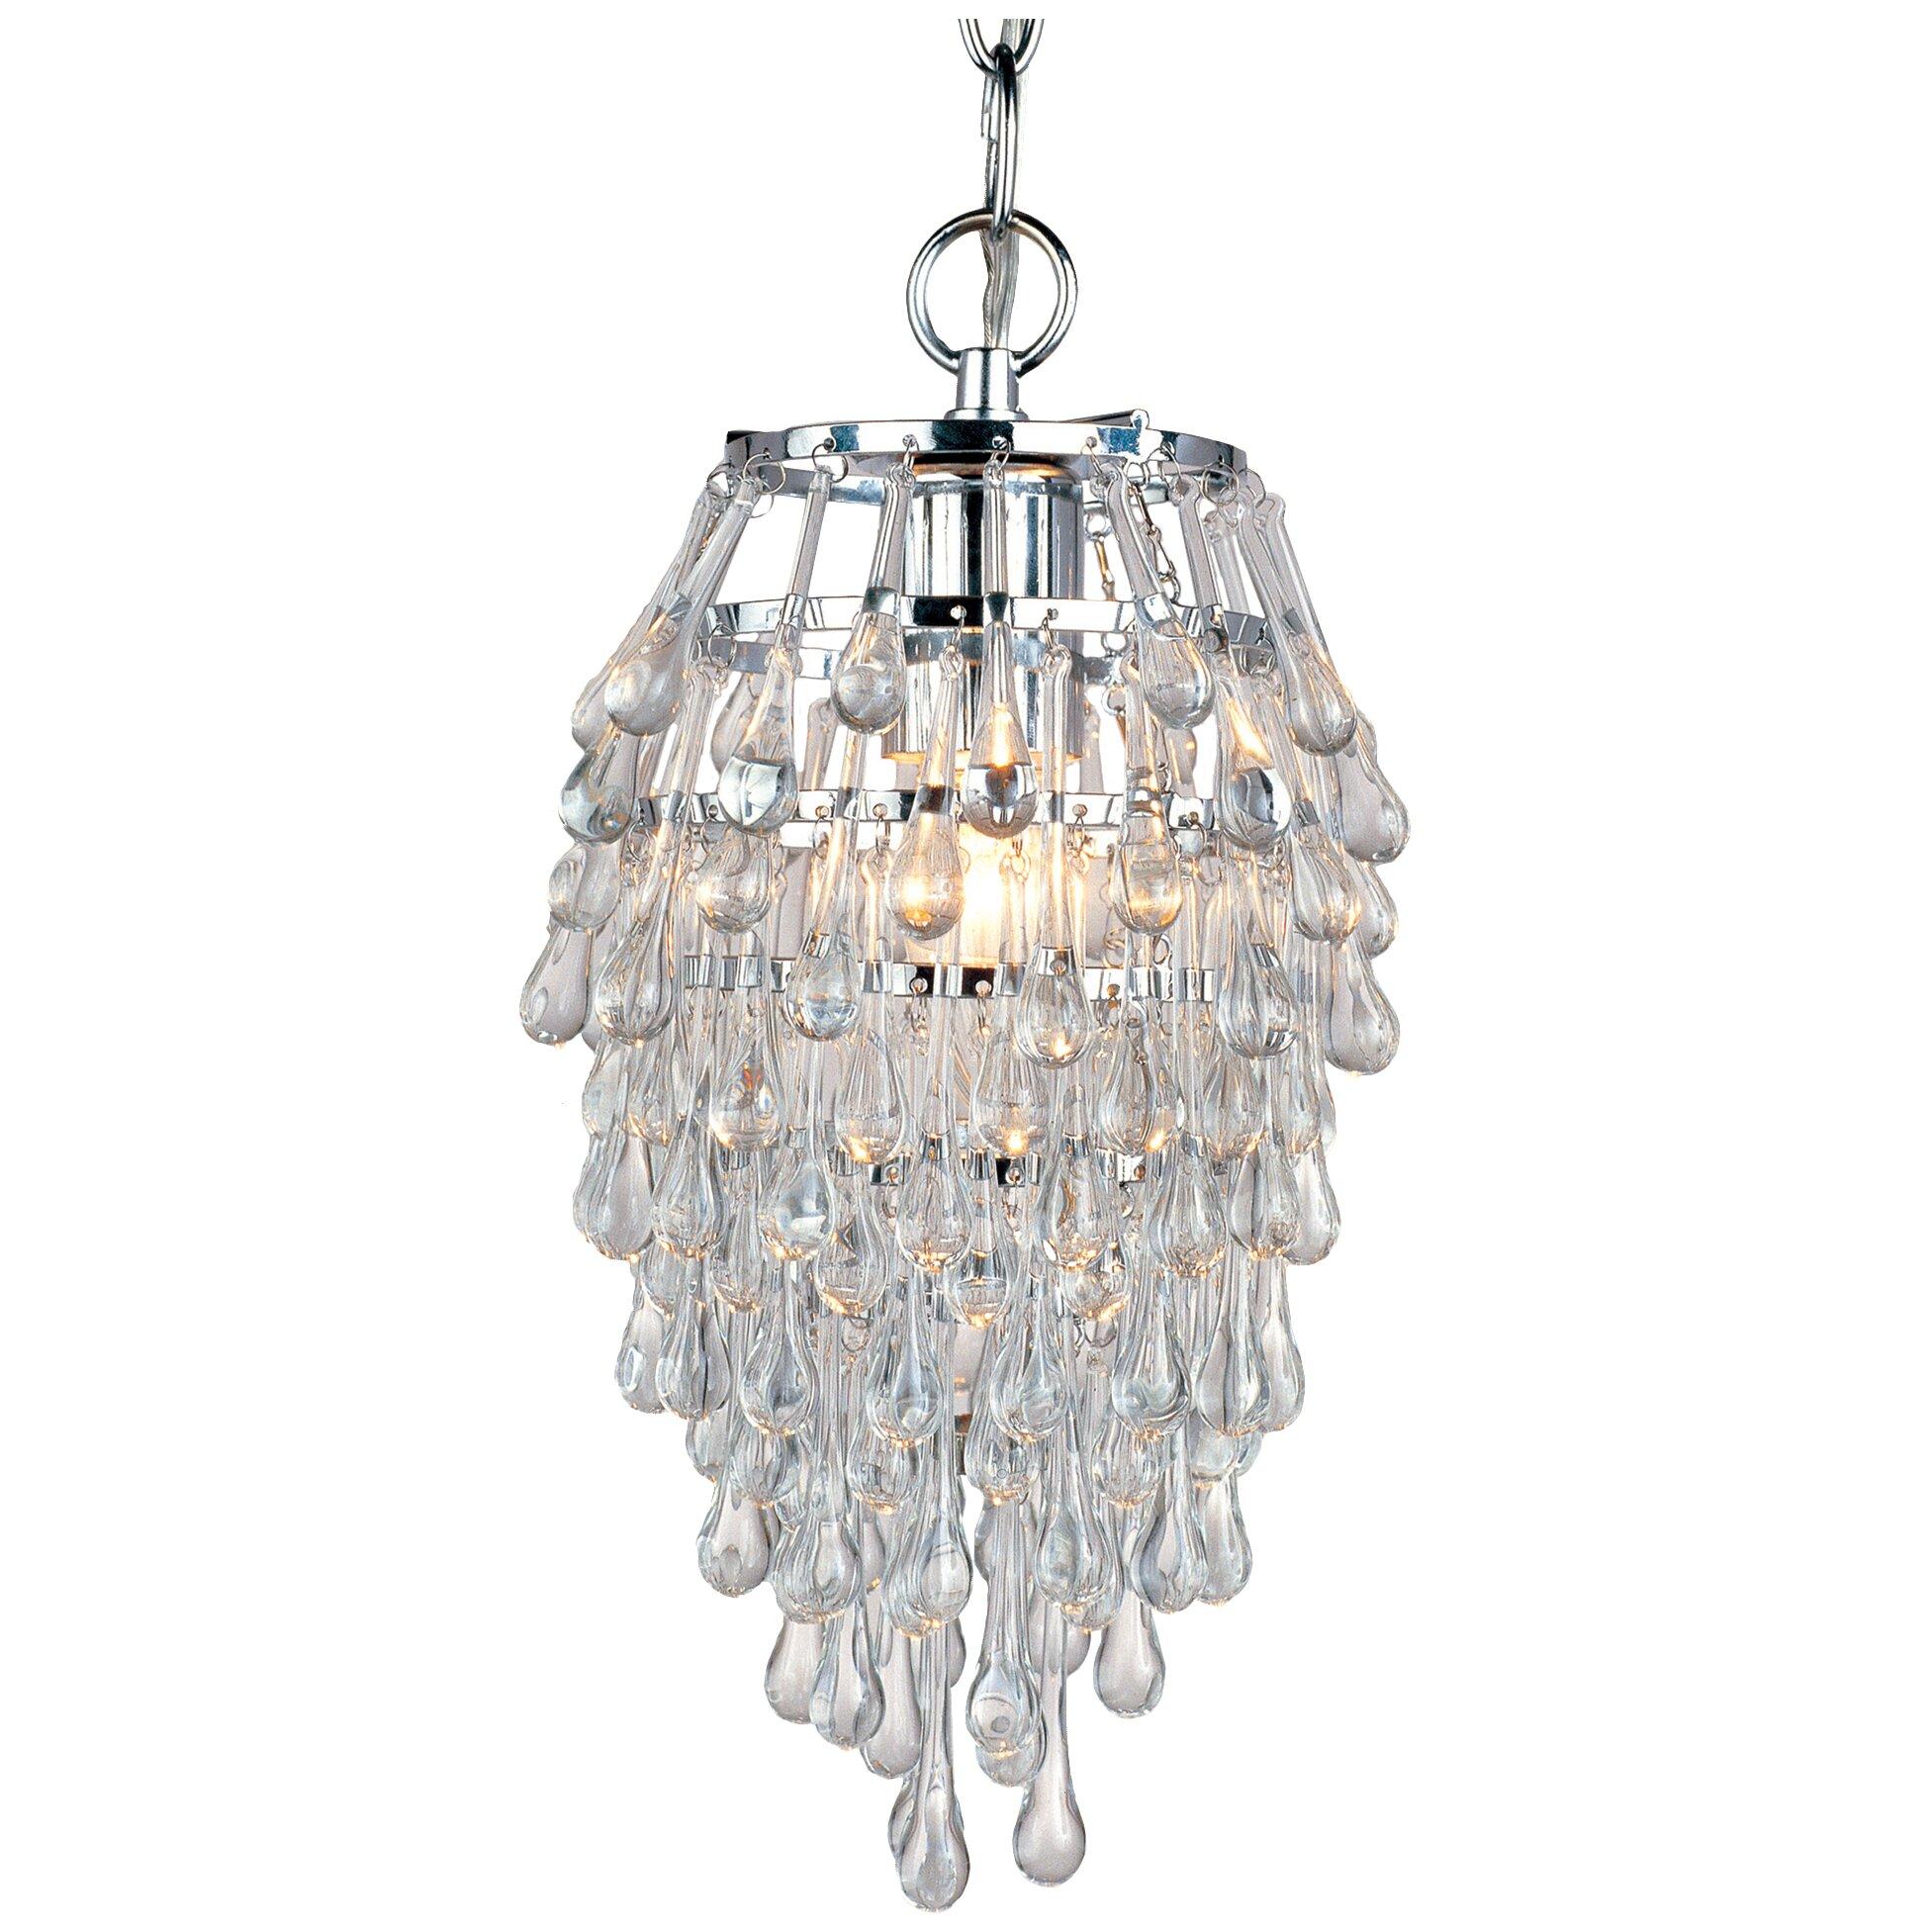 af lighting elements teardrop light crystal pendant  reviews, Lighting ideas